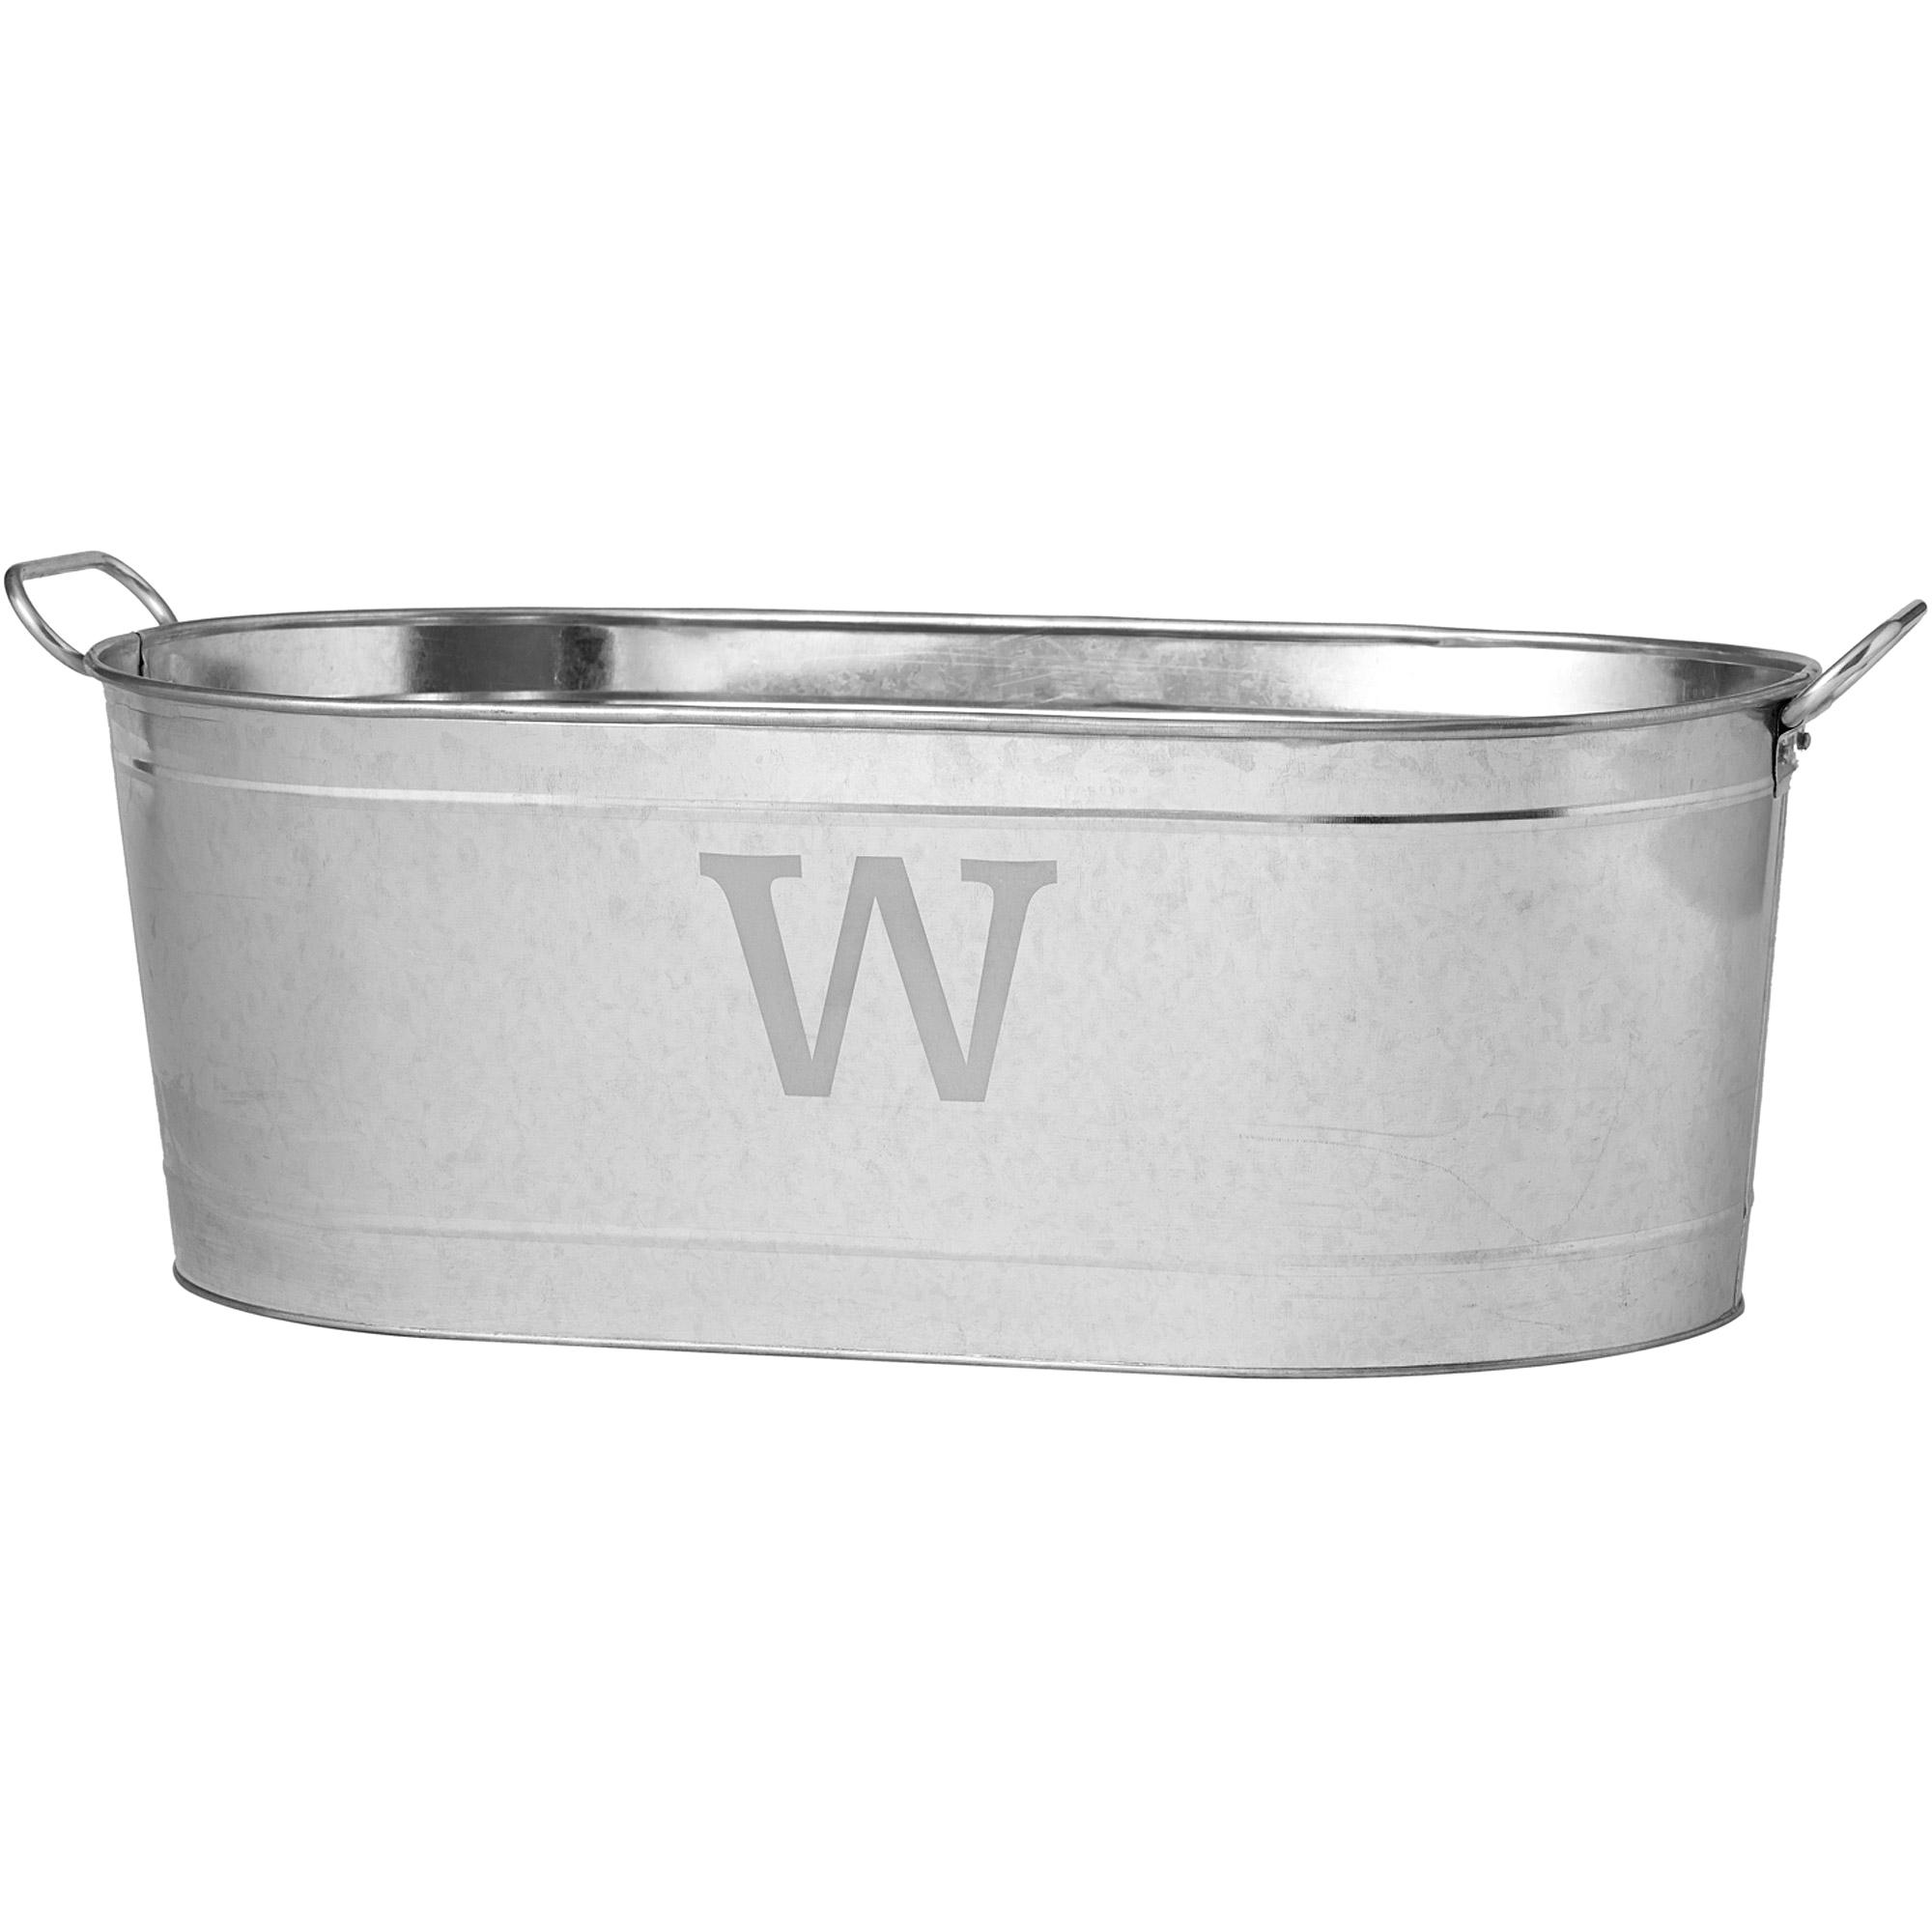 personalized galvanized beverage tub initial price